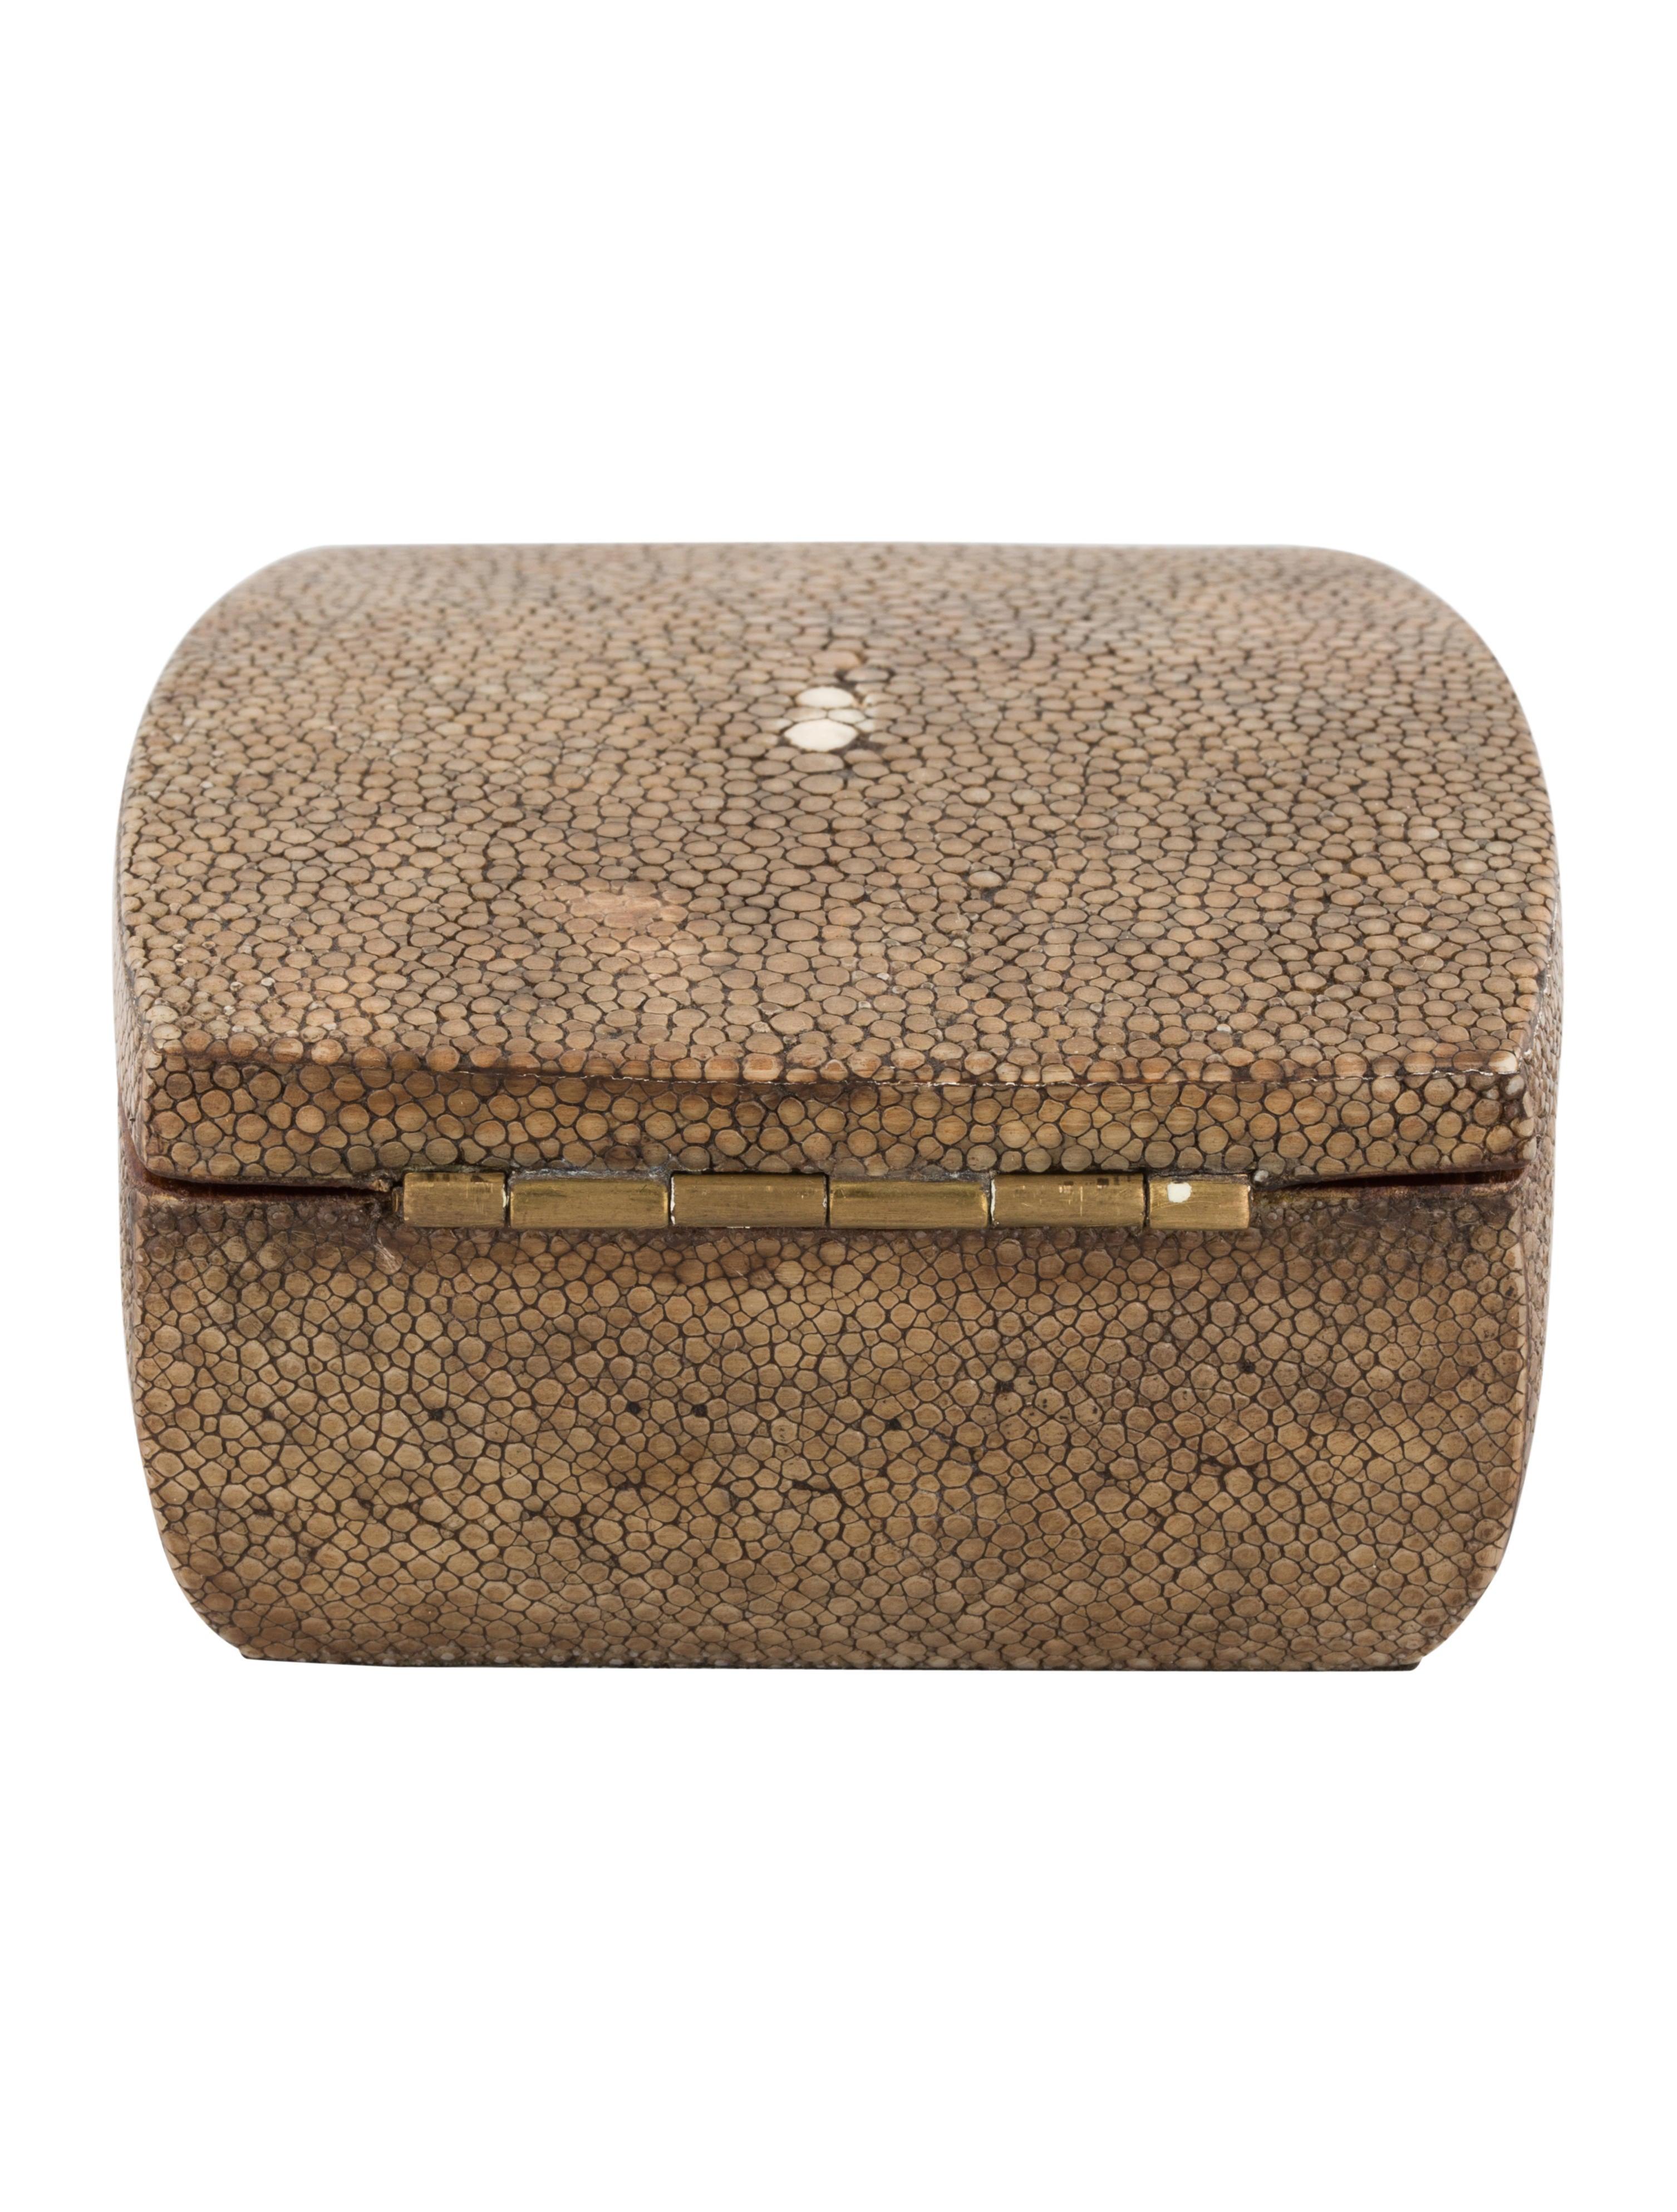 RY Augousti Shagreen Jewelry Box Decor And Accessories RAY20242